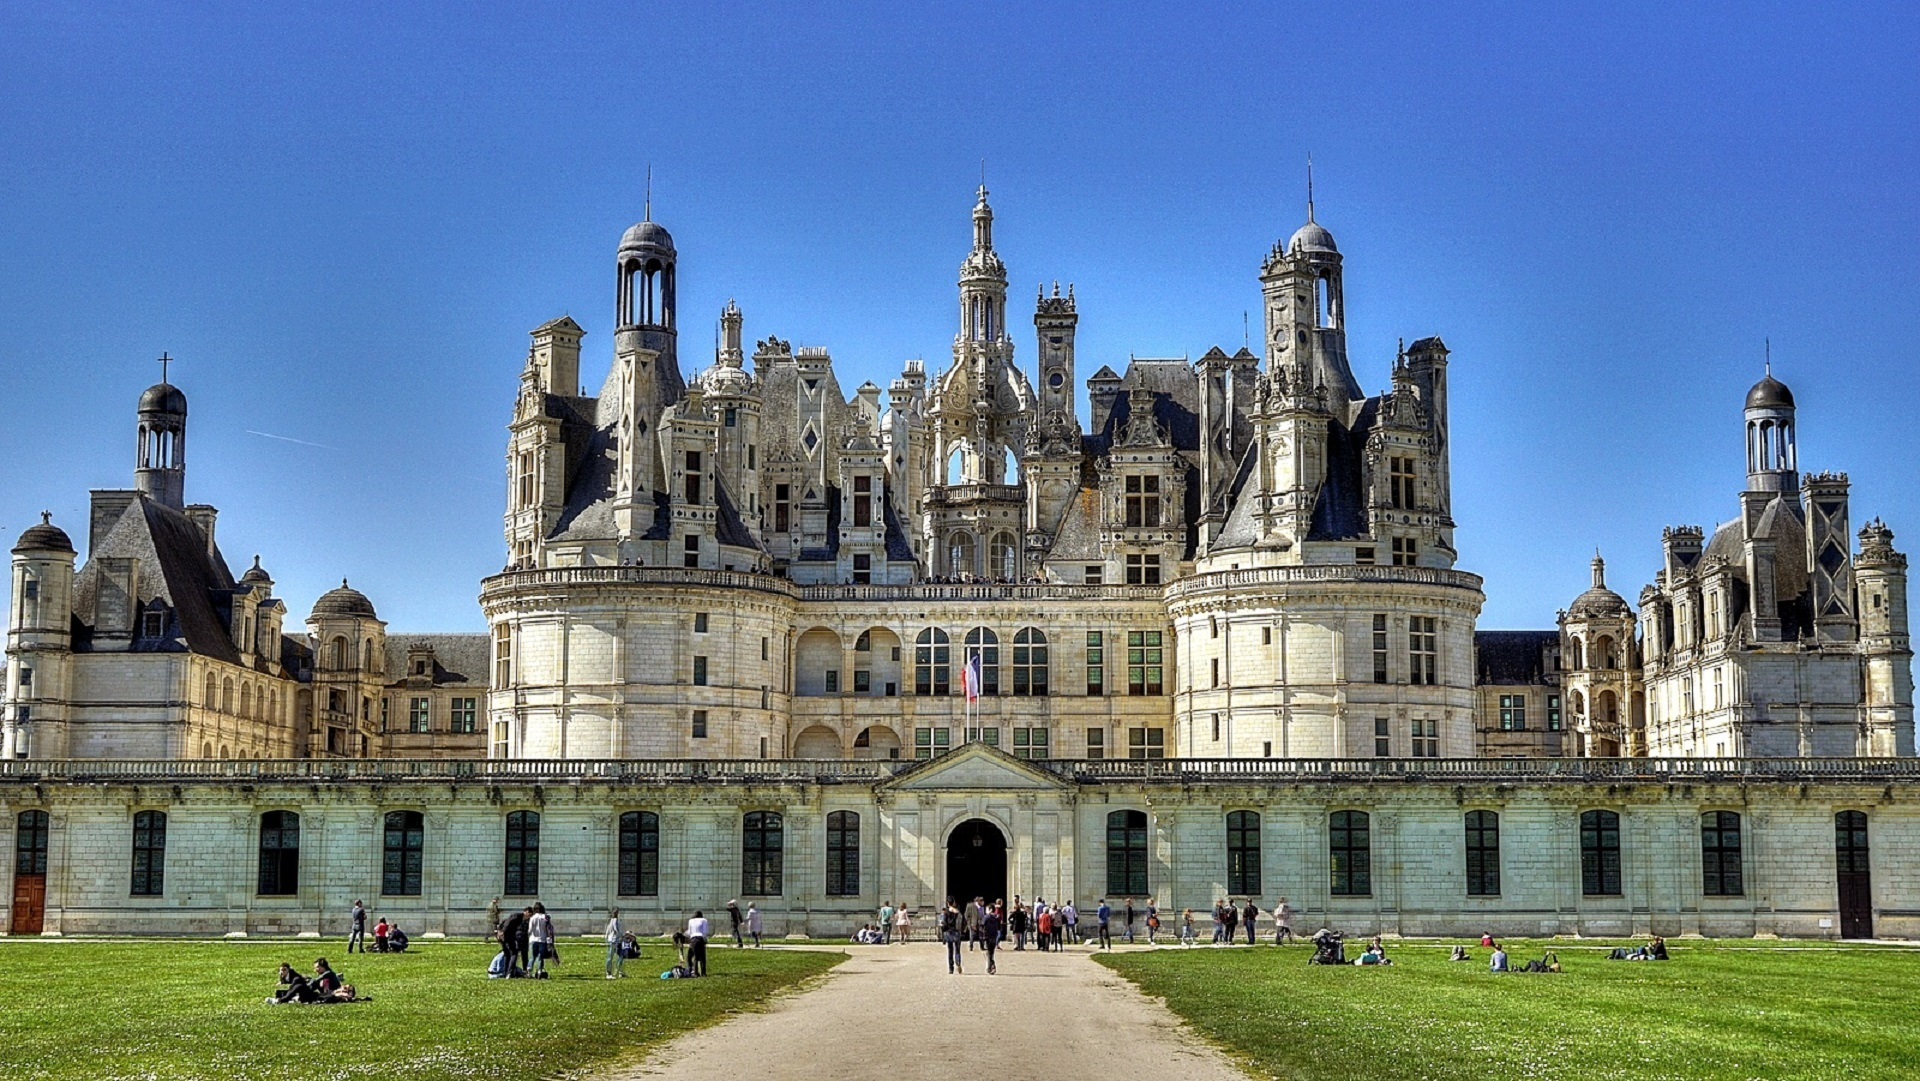 Chateau de chambord photo